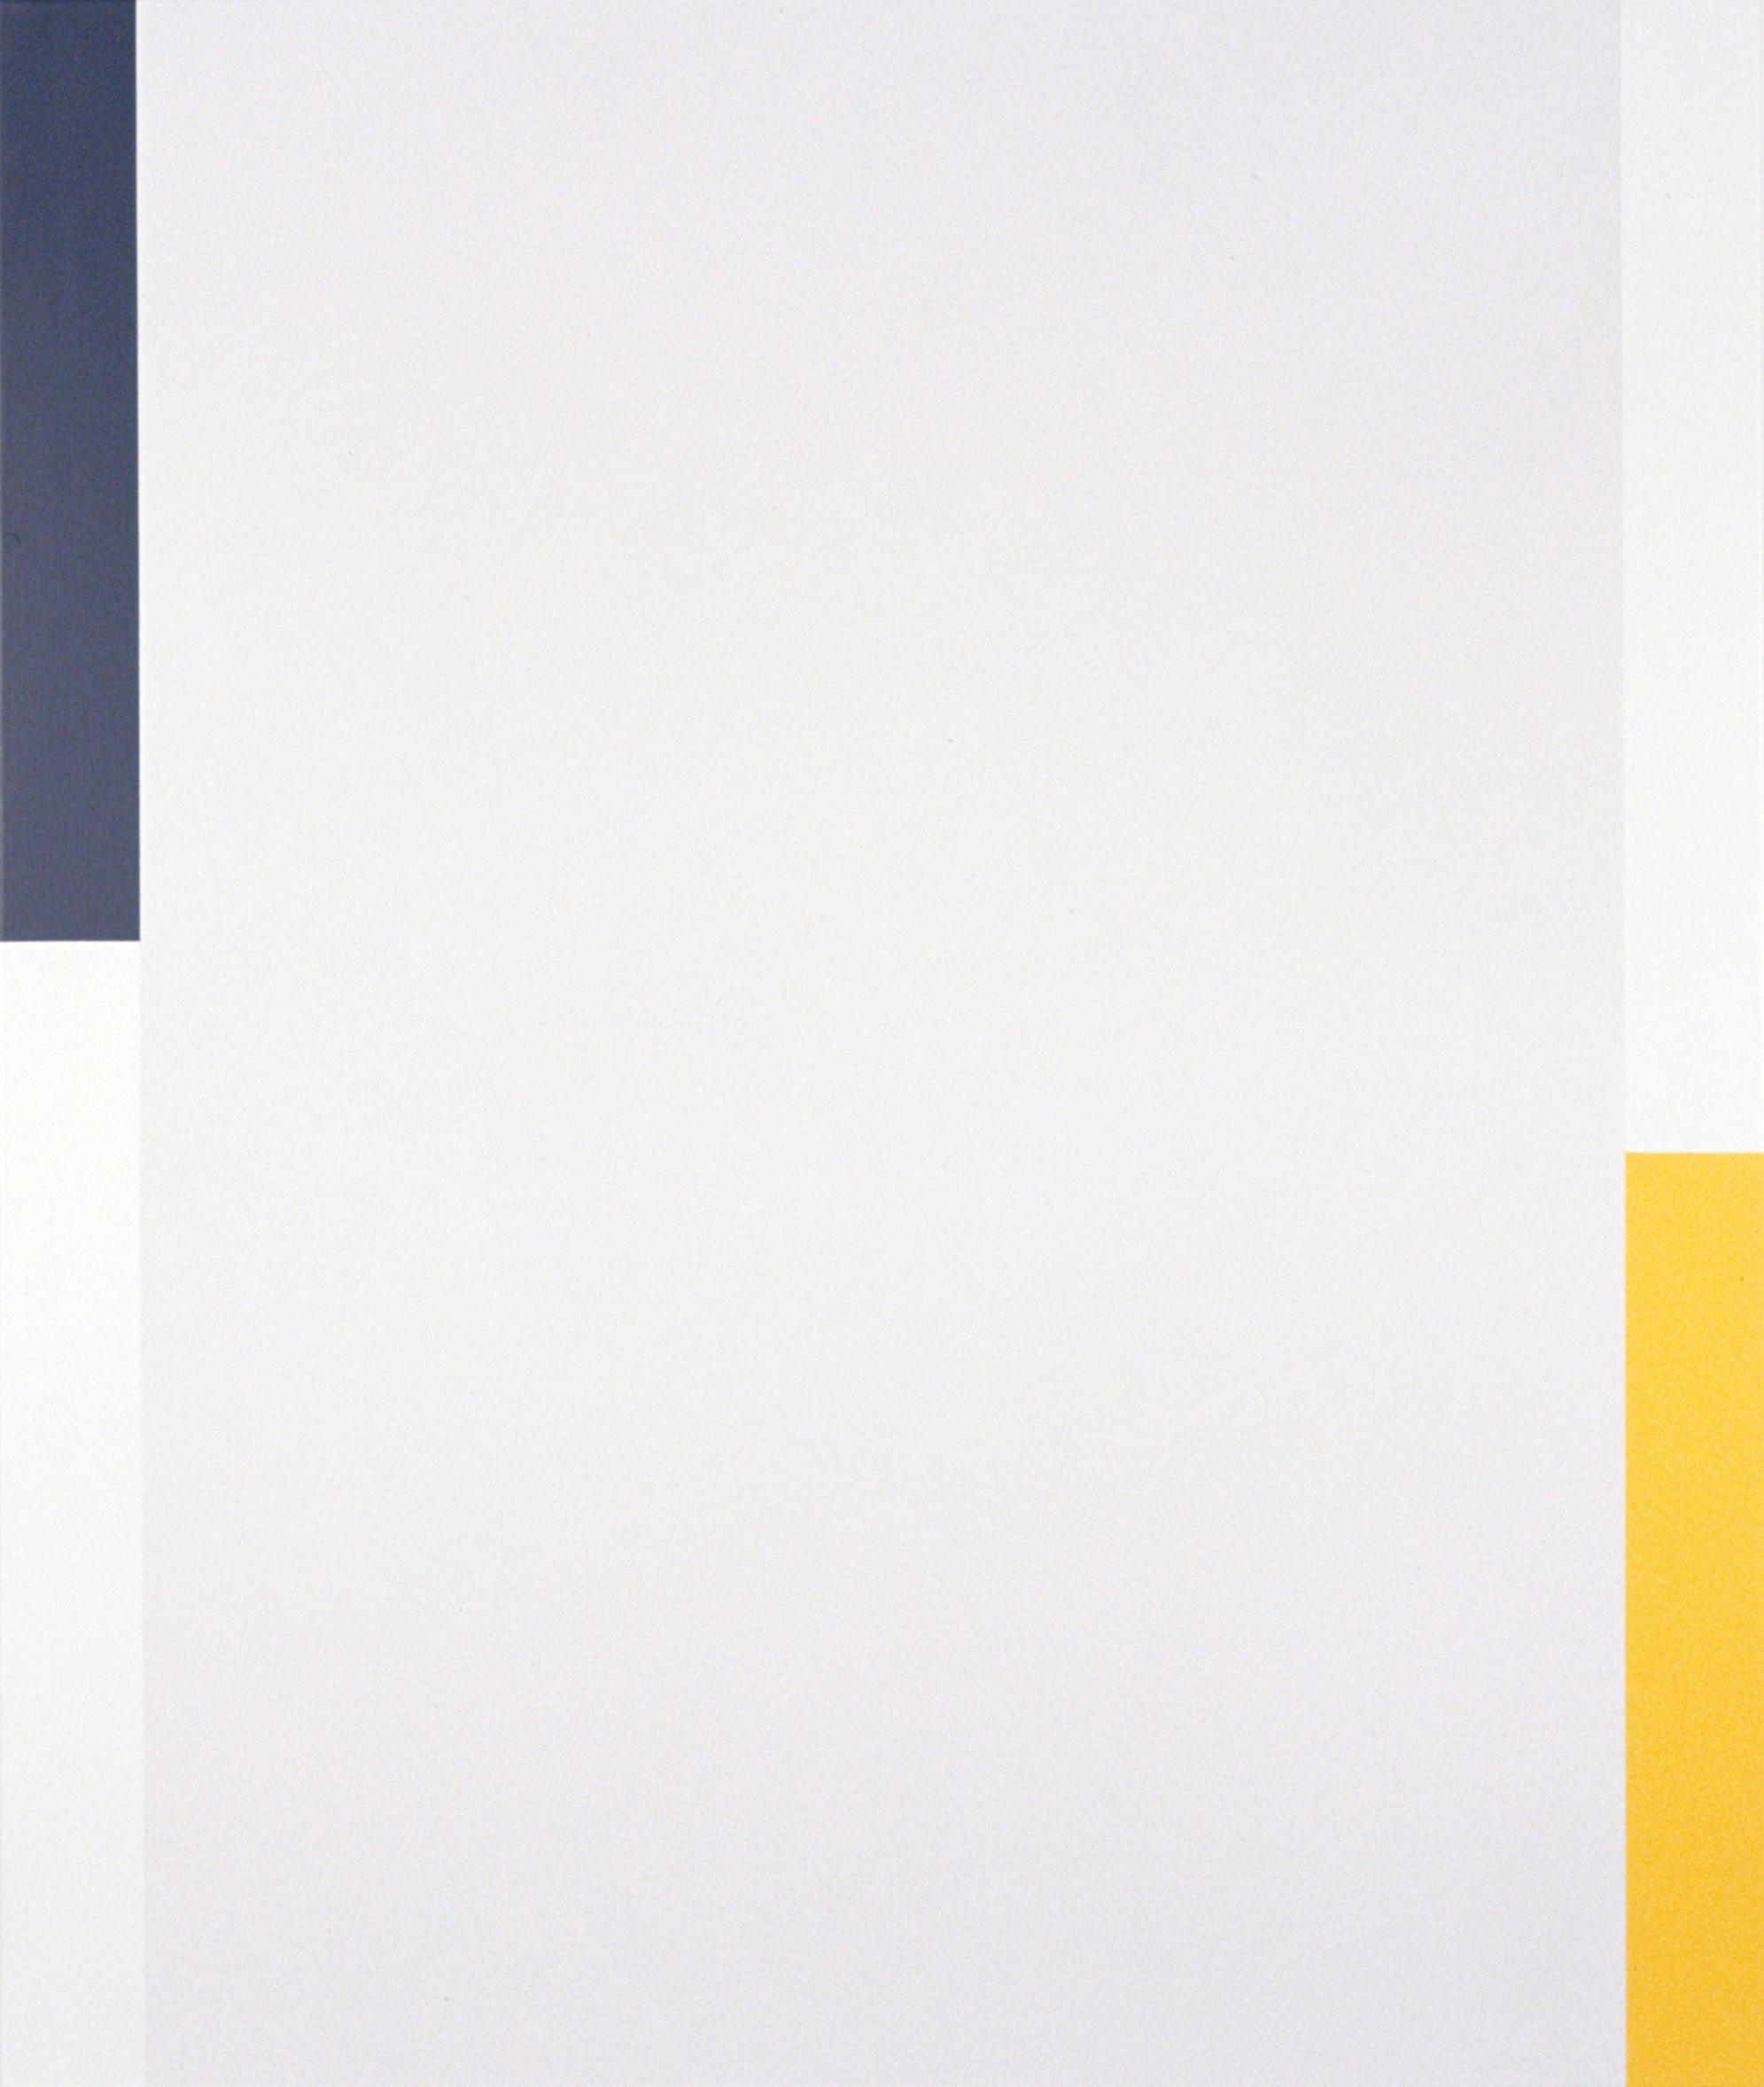 VIRGINIA COVENTRY  Step , 2007 acrylic, vinyl, metallic pigments on linen 180 x 150 cm